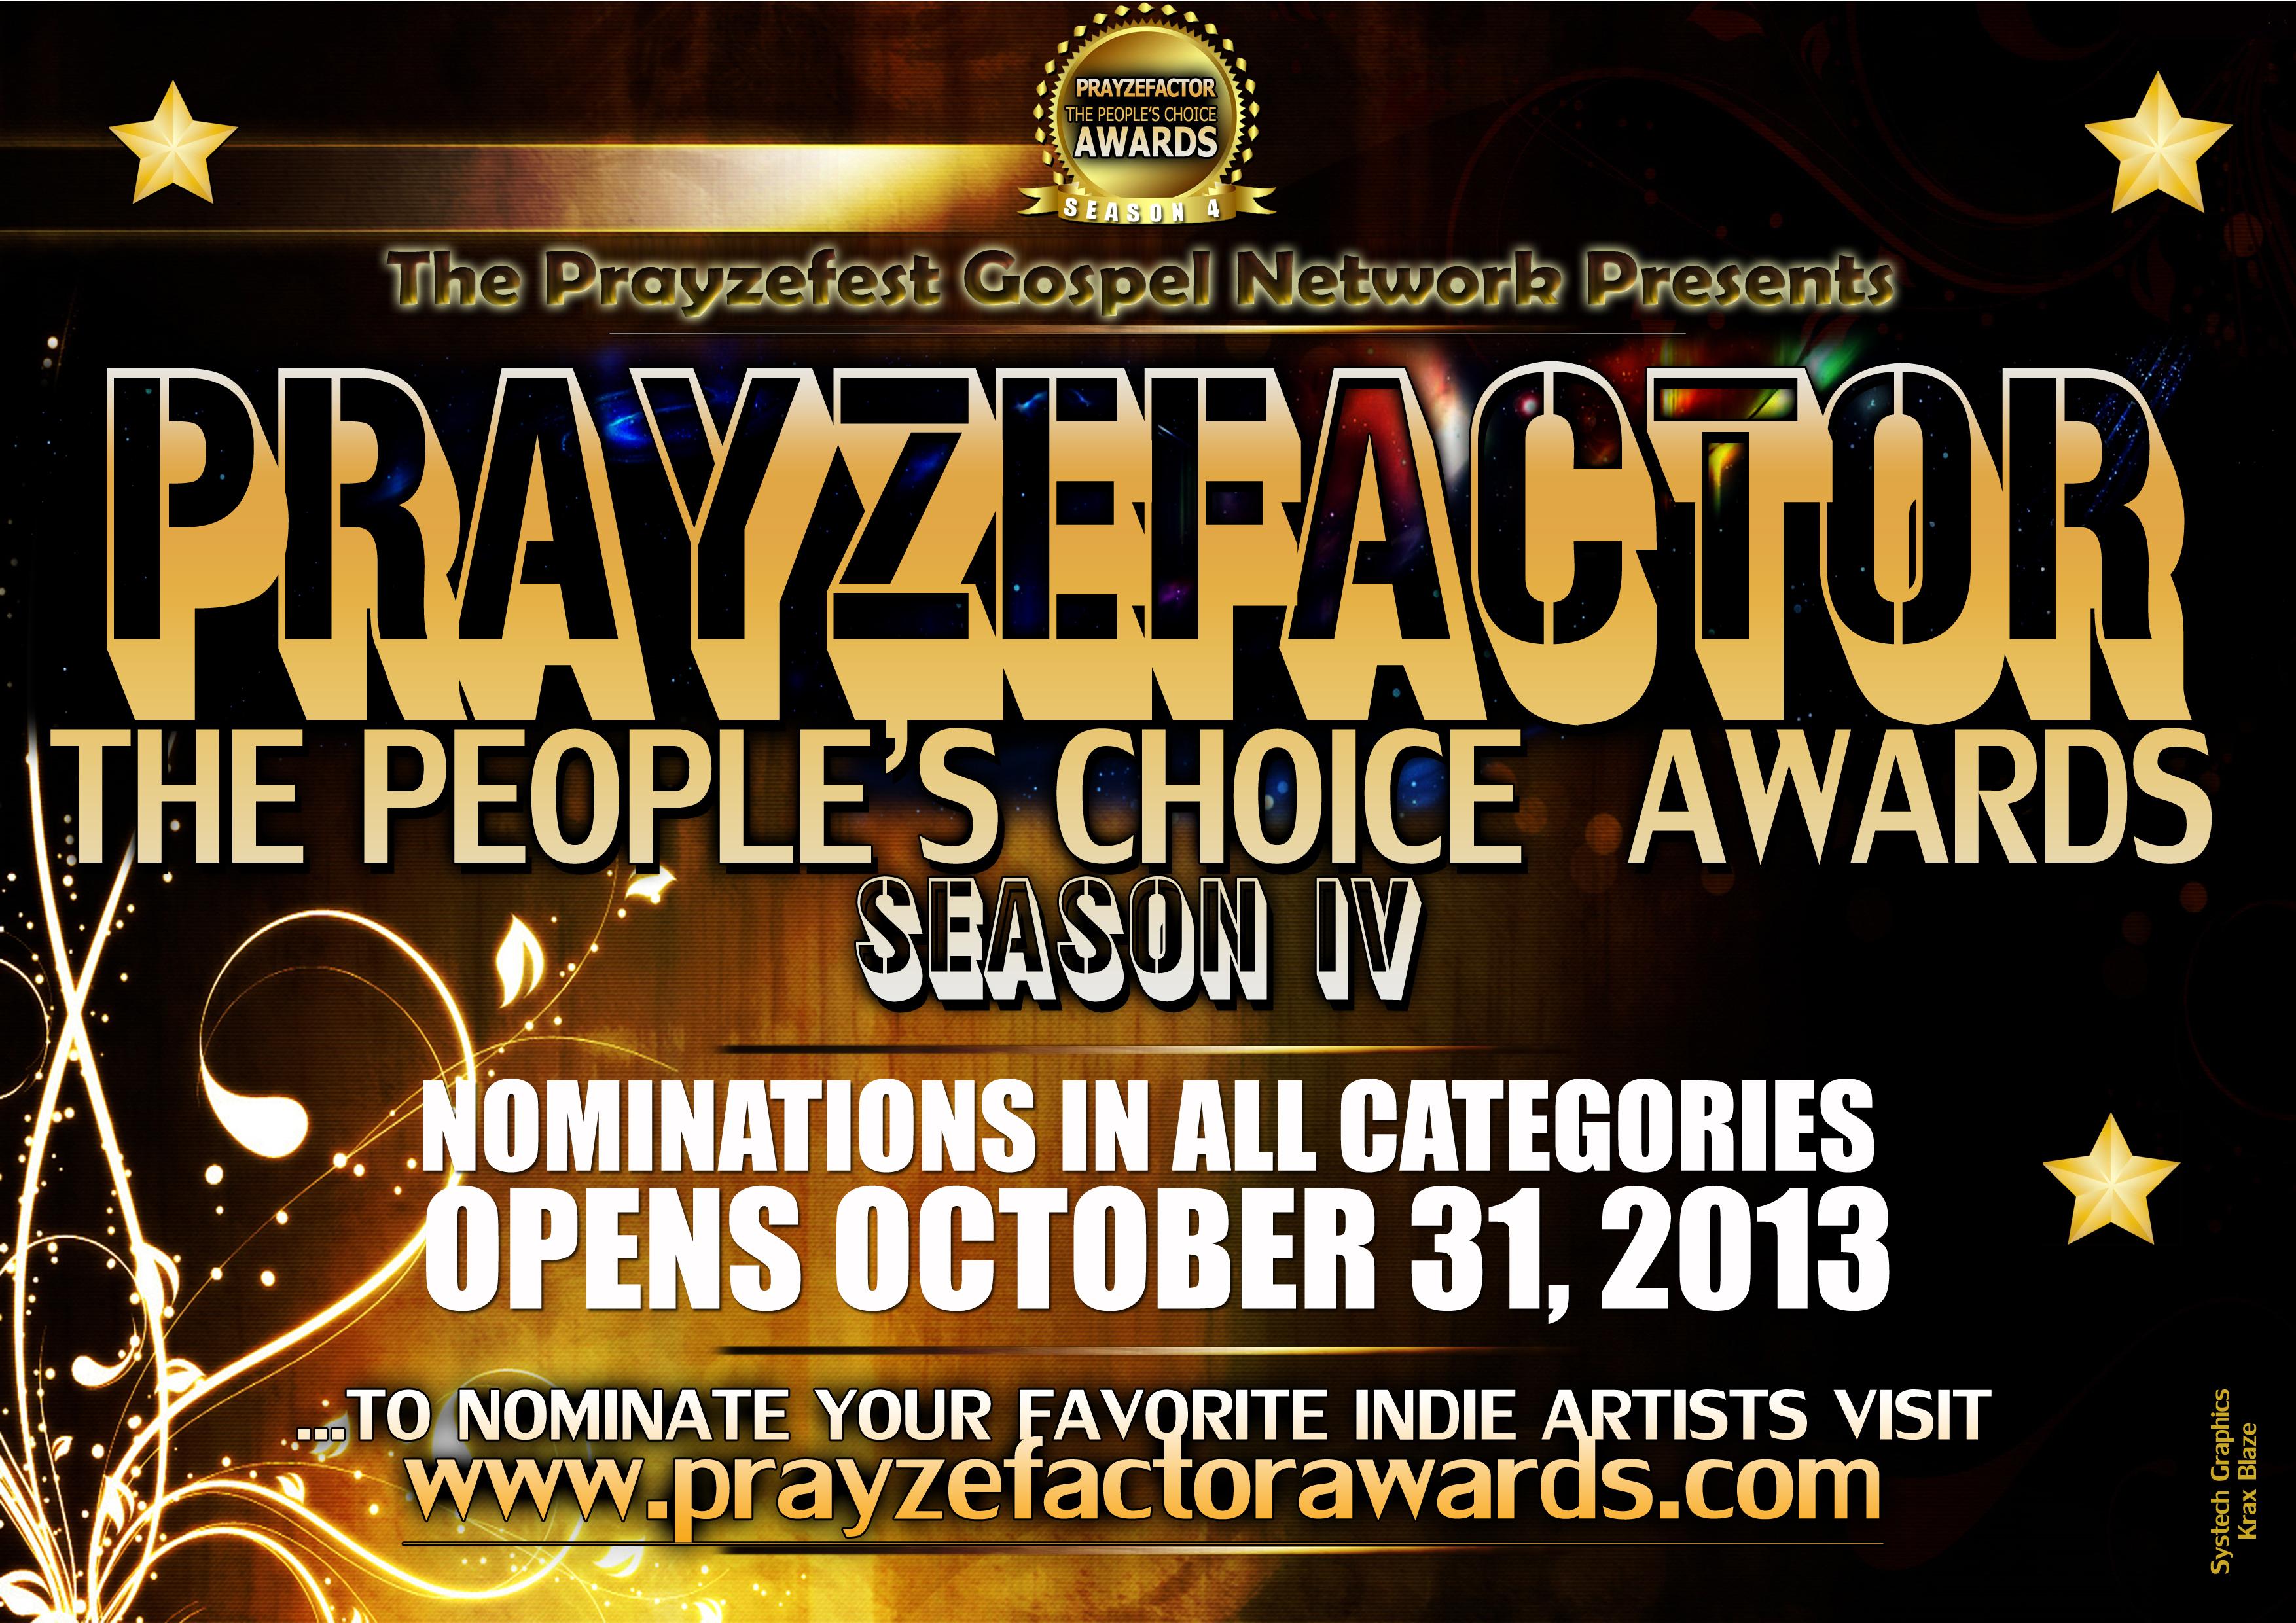 Season 4 Nominations Now Open